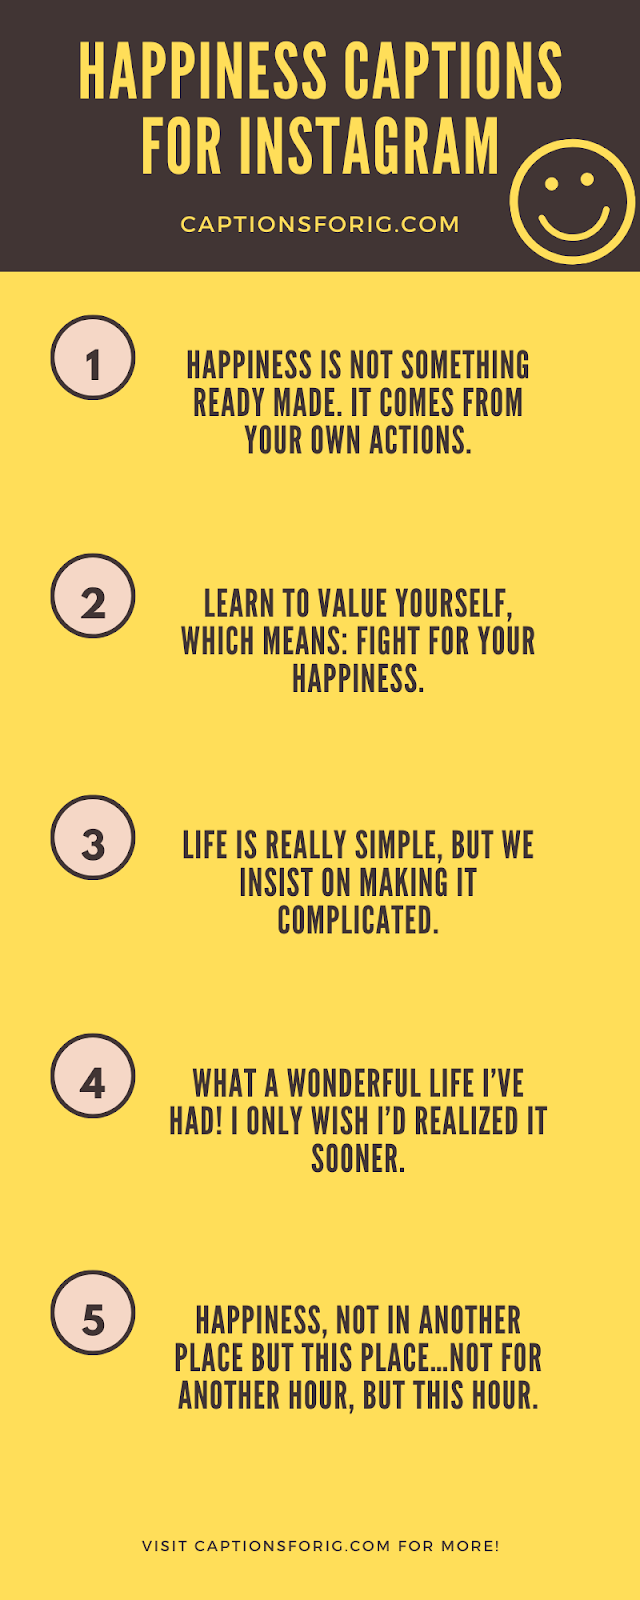 35 Joyful Instagram Captions On Happiness 2021 Captions For Ig